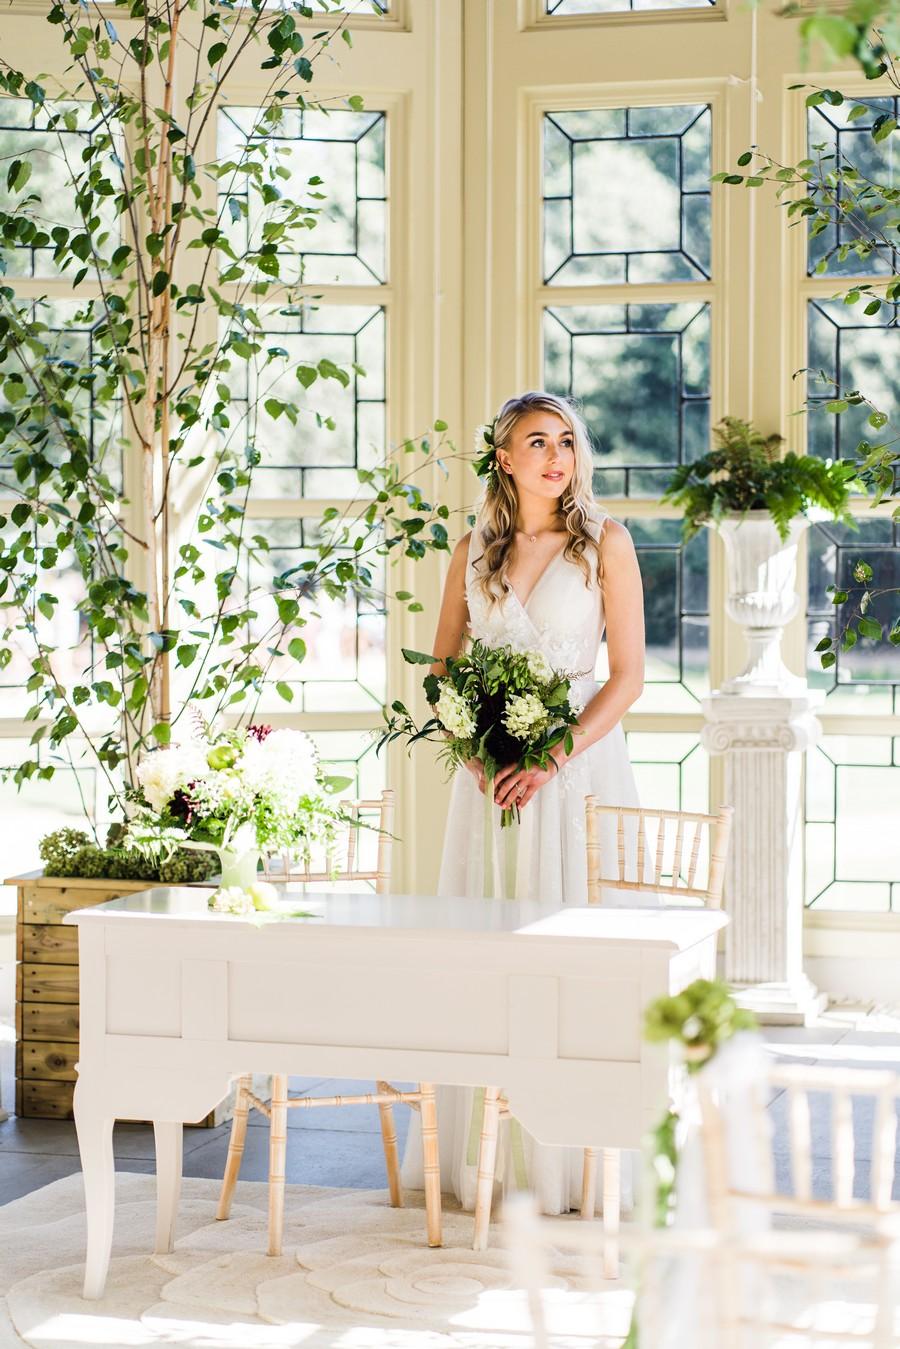 Highcliffe Castle wedding inspiration on the English Wedding Blog (21)